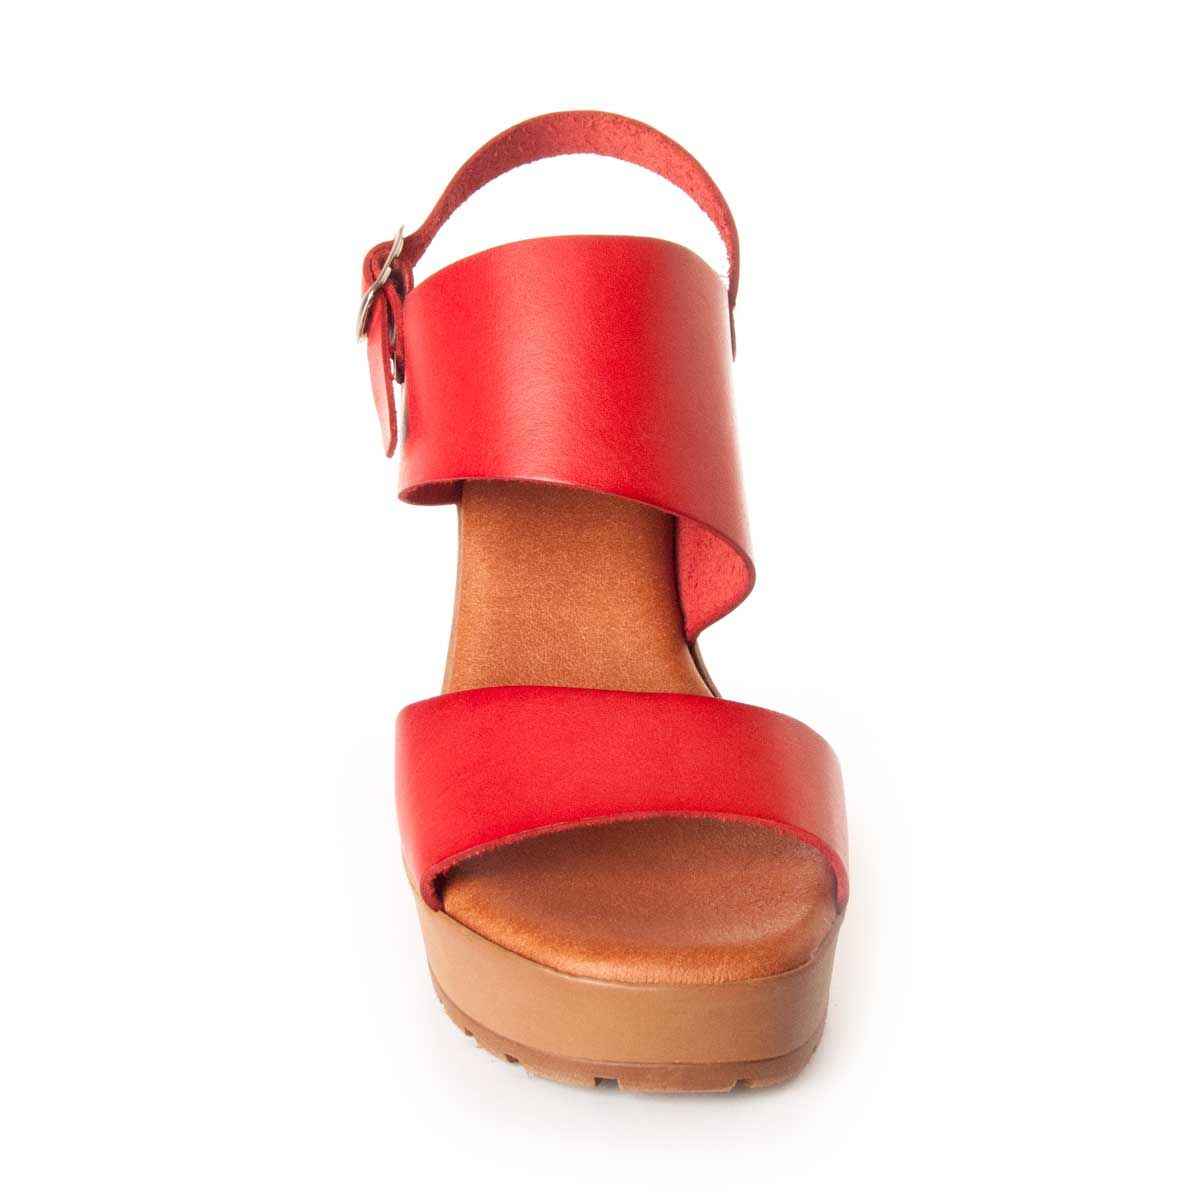 Leindia Platform Sandal in Red